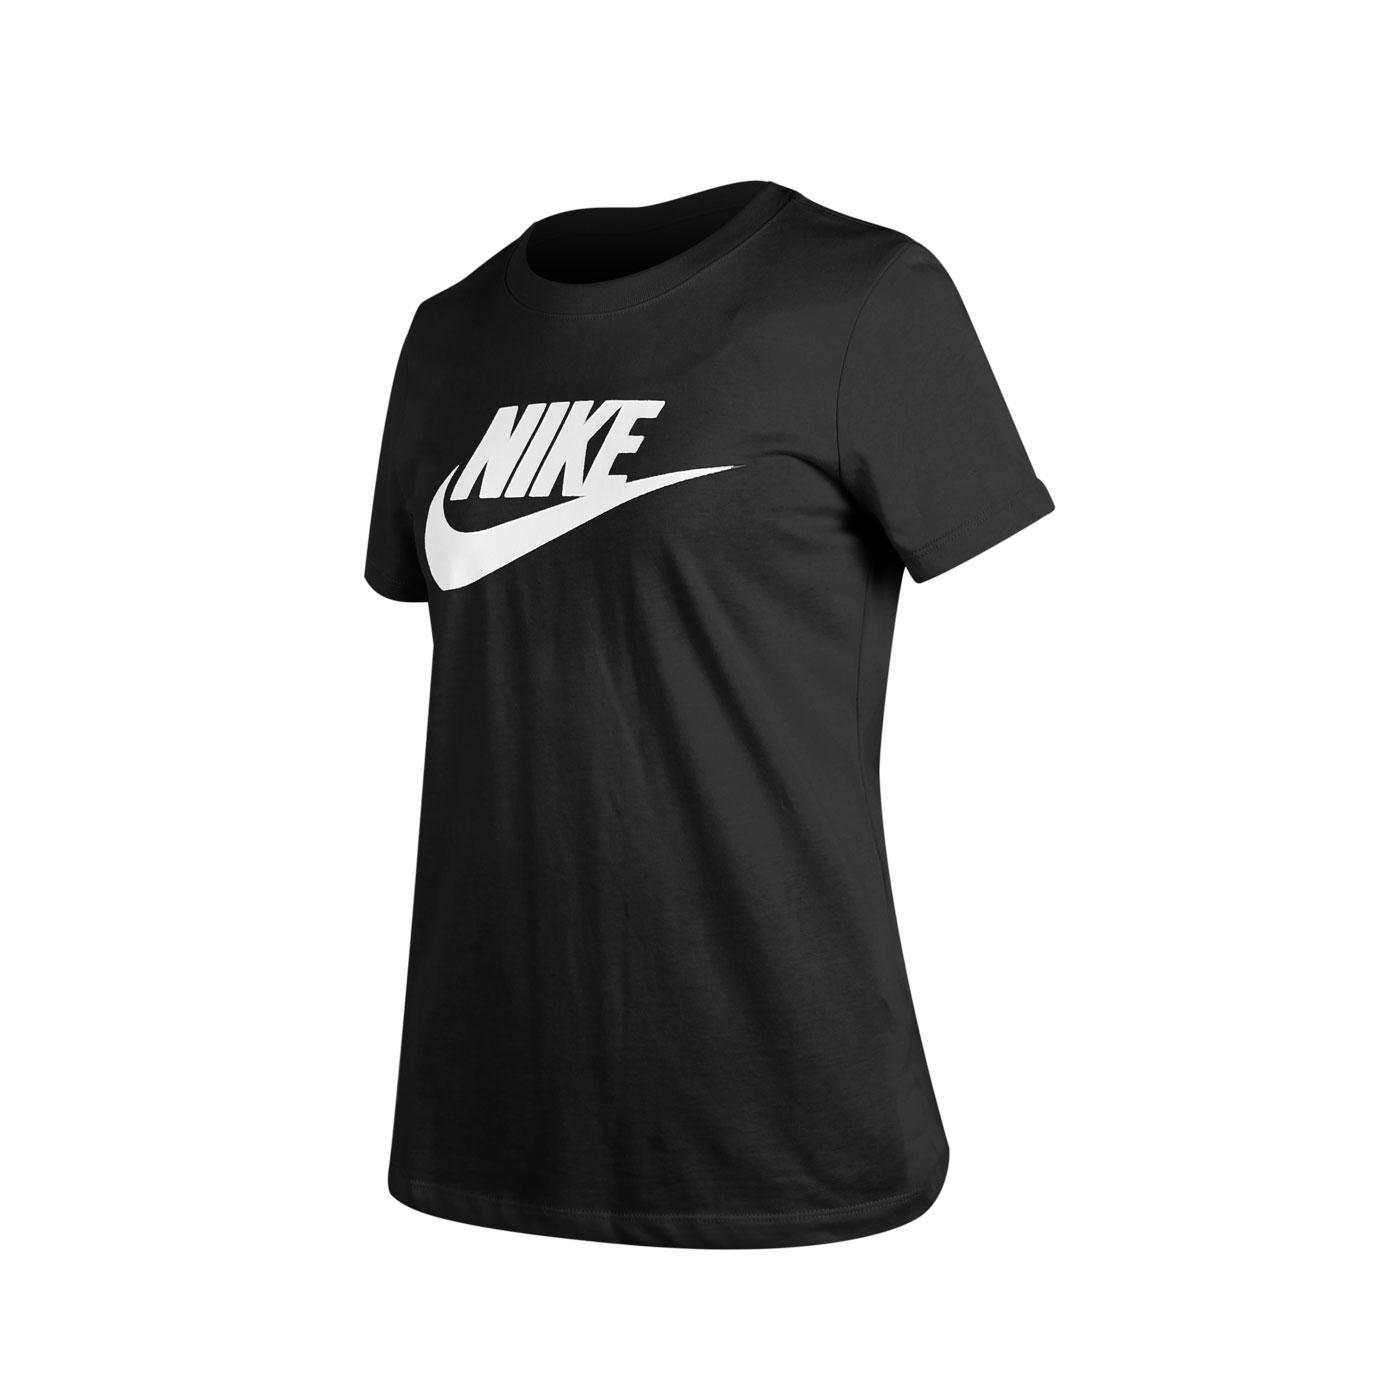 NIKE 女款短袖T恤 BV6170010 - 黑白